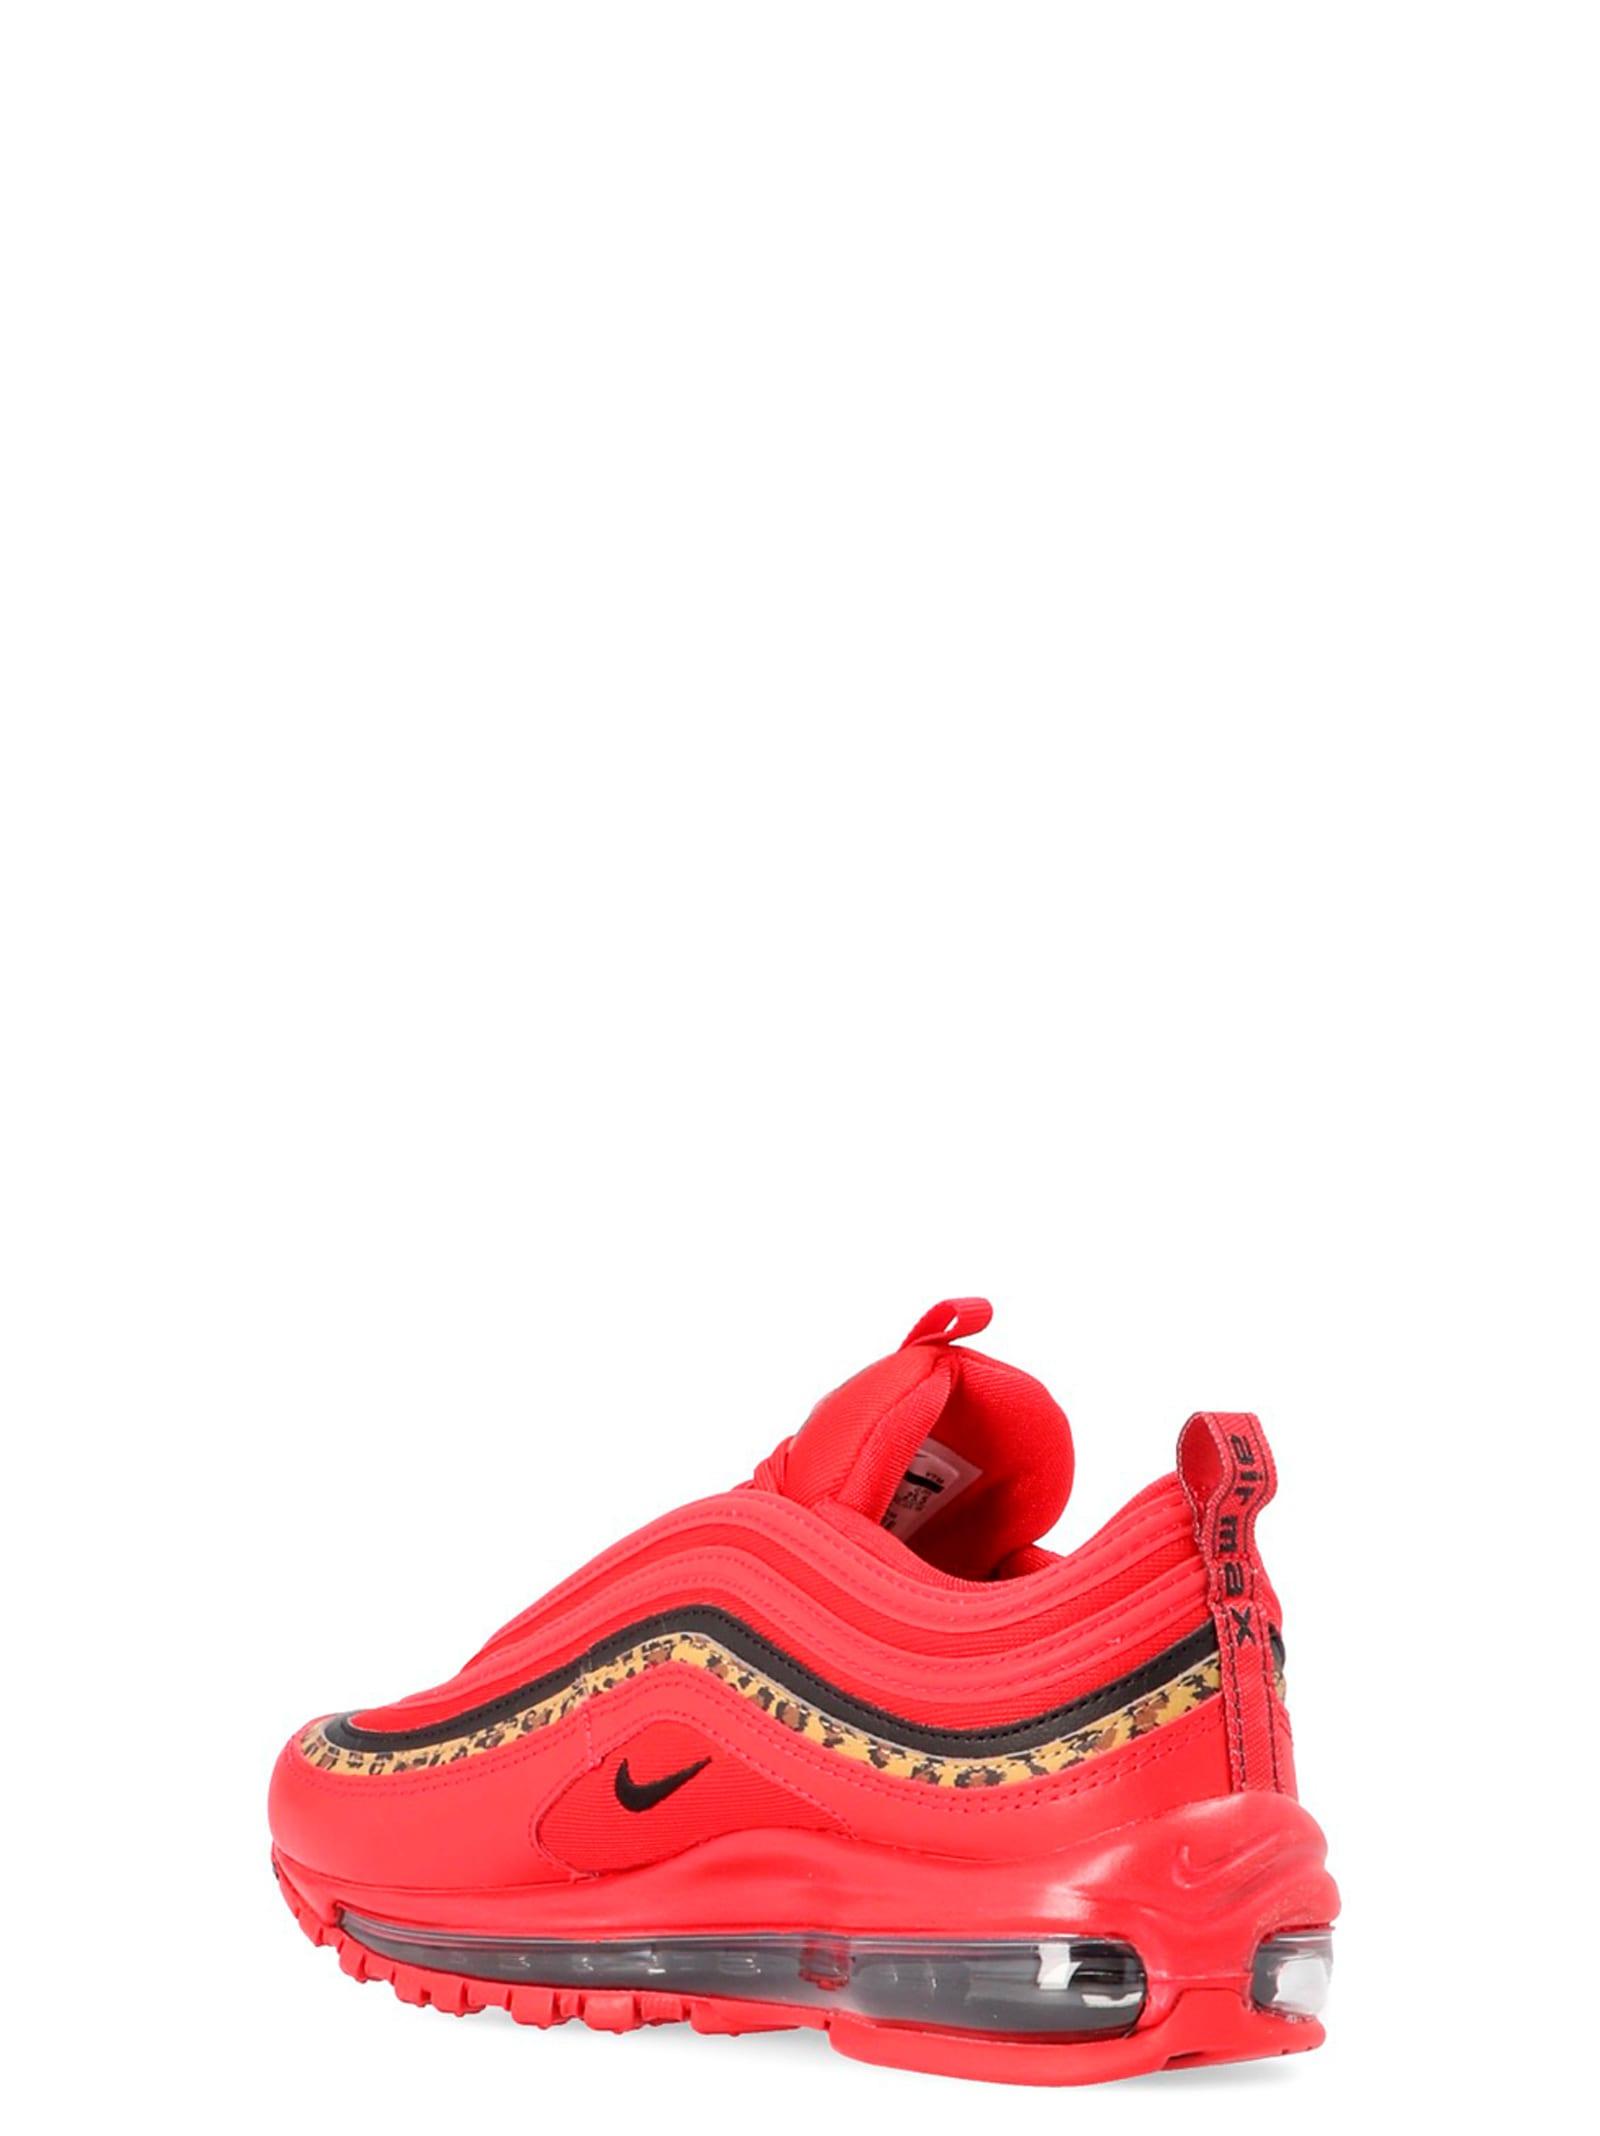 online store 6f73a d0ebf Nike 'w Air Max 97' Shoes